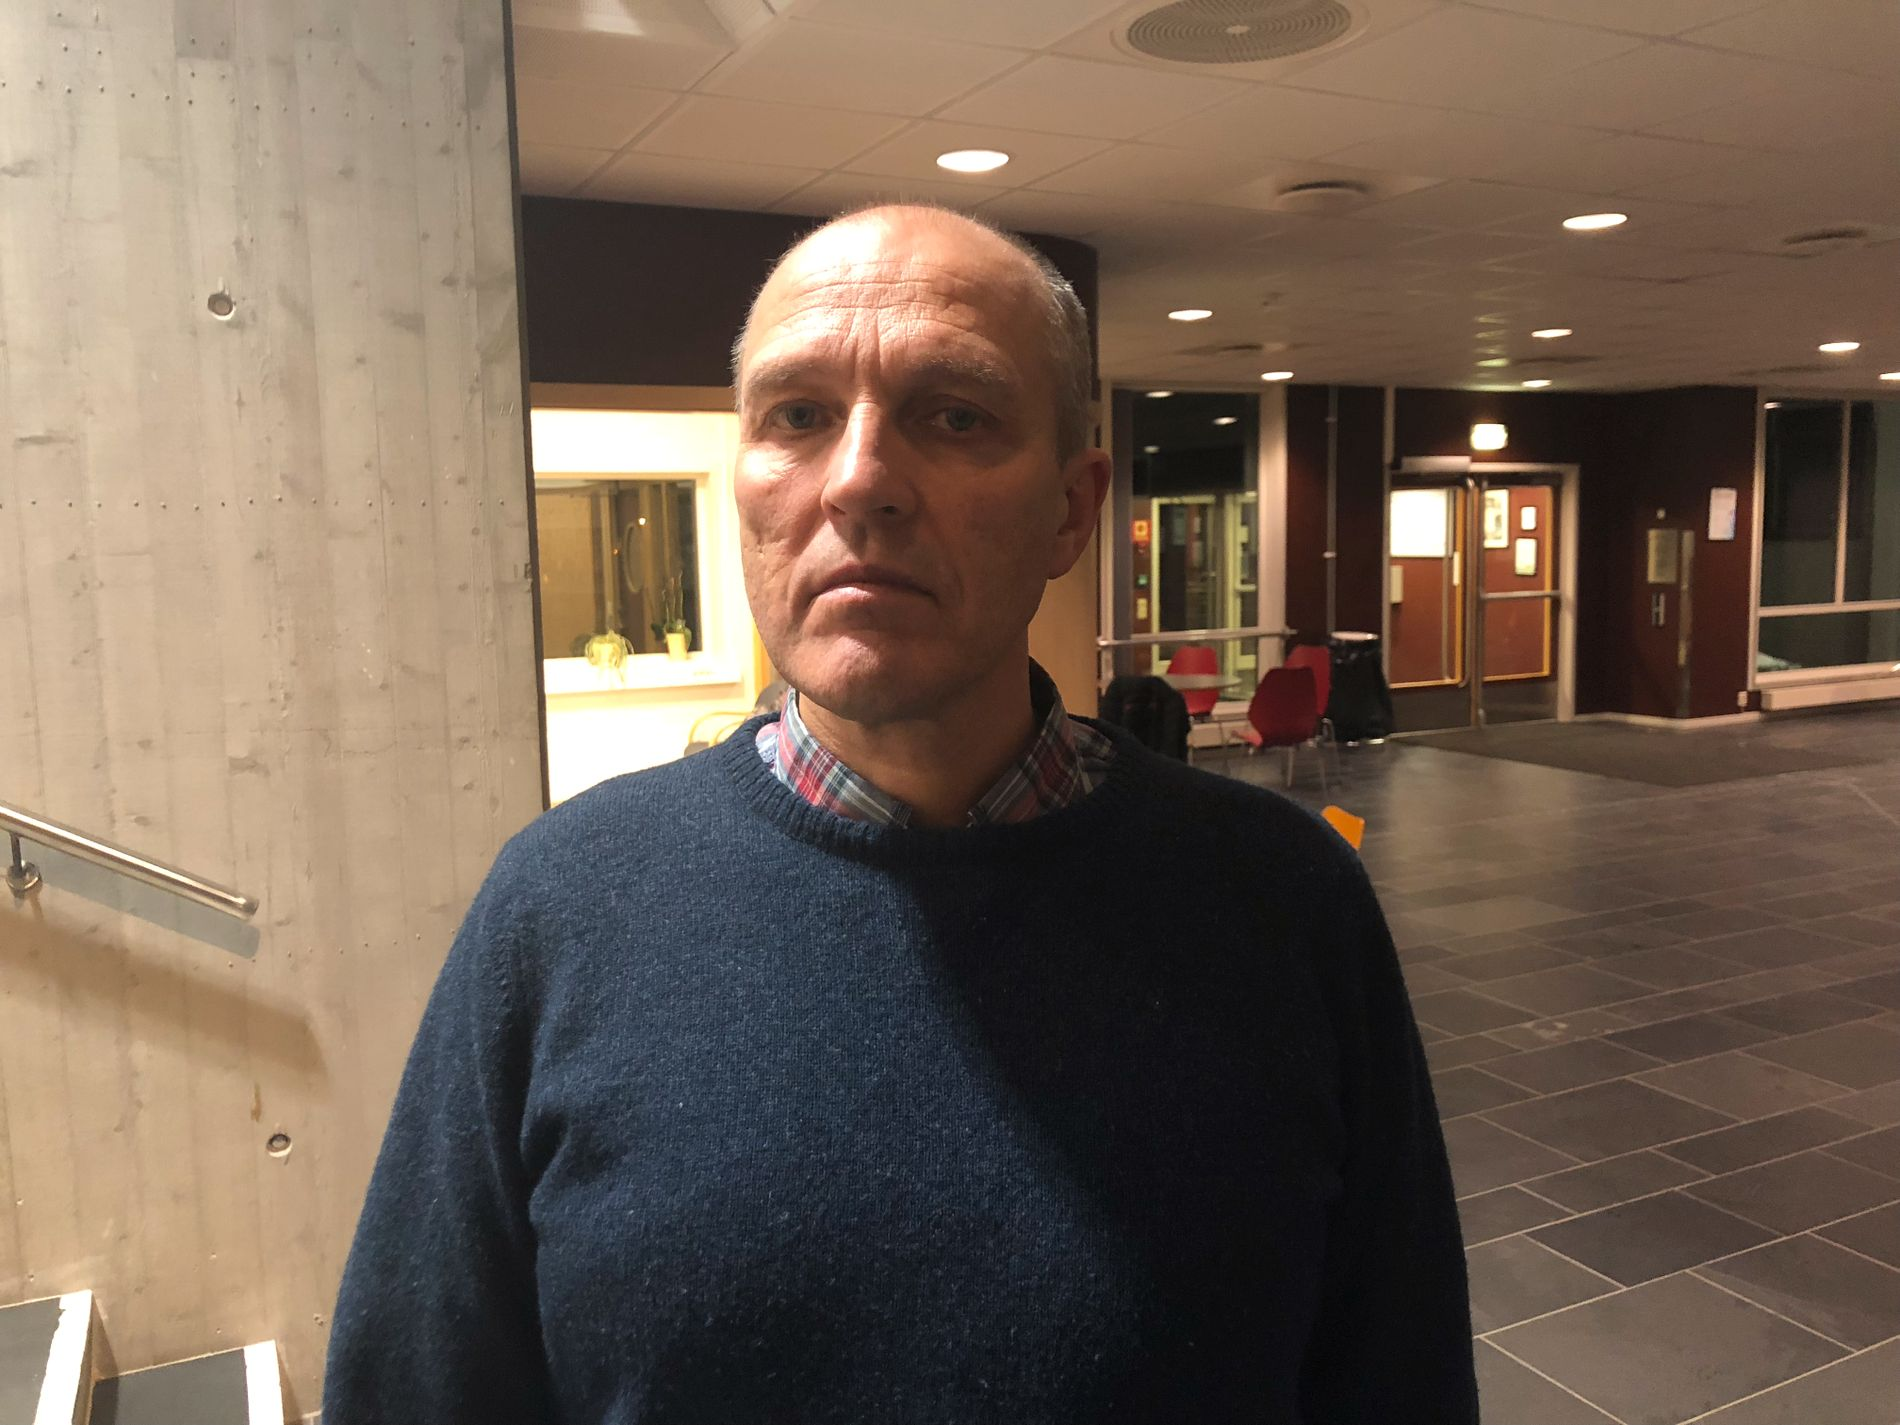 SKOLE: Rektor Leif Solheim ved Vinstra videregående skole har vært til stede på skolen i kveld.